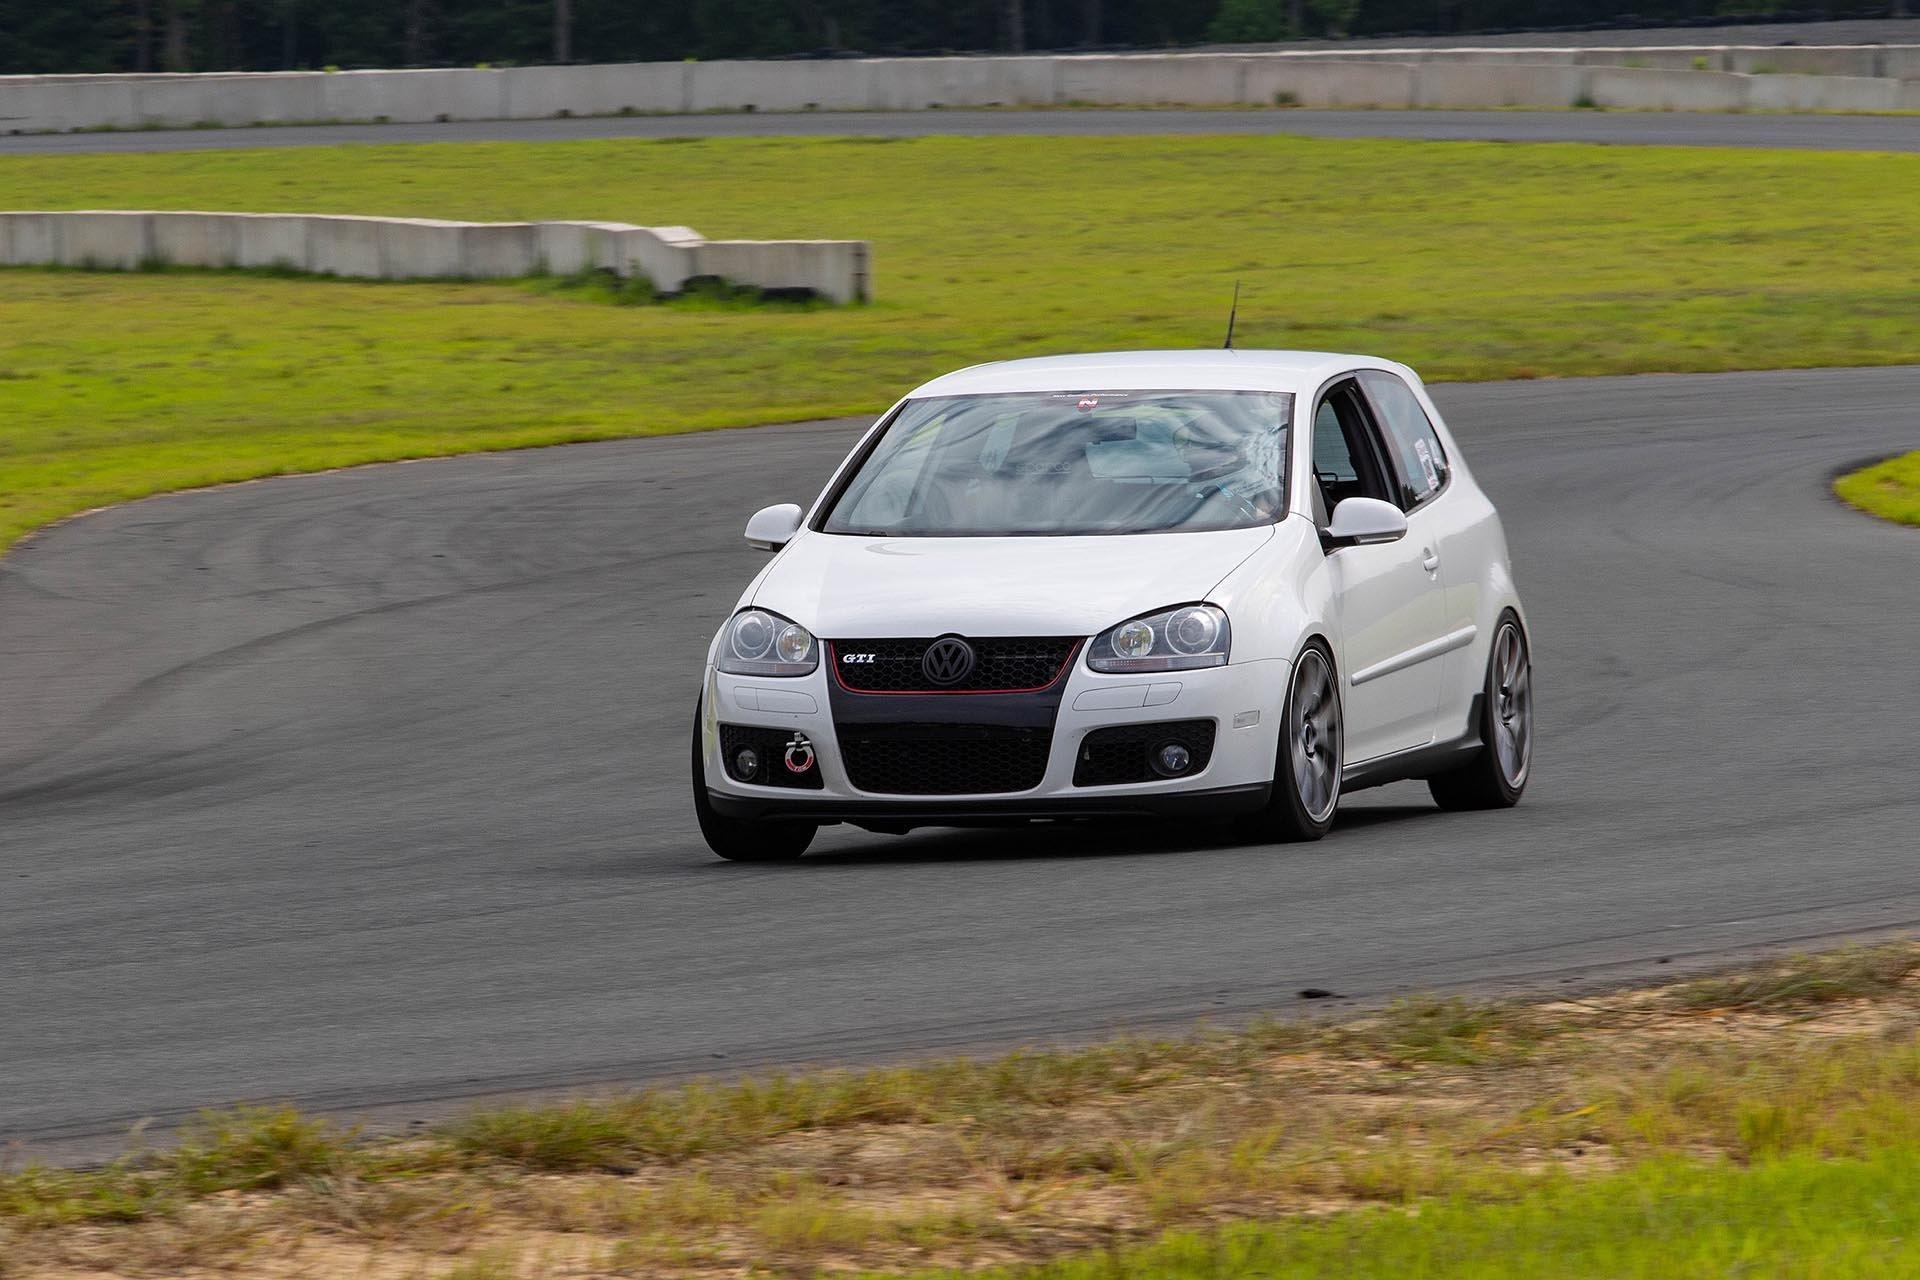 06_VW Mk5 White GTI 6-speed on track